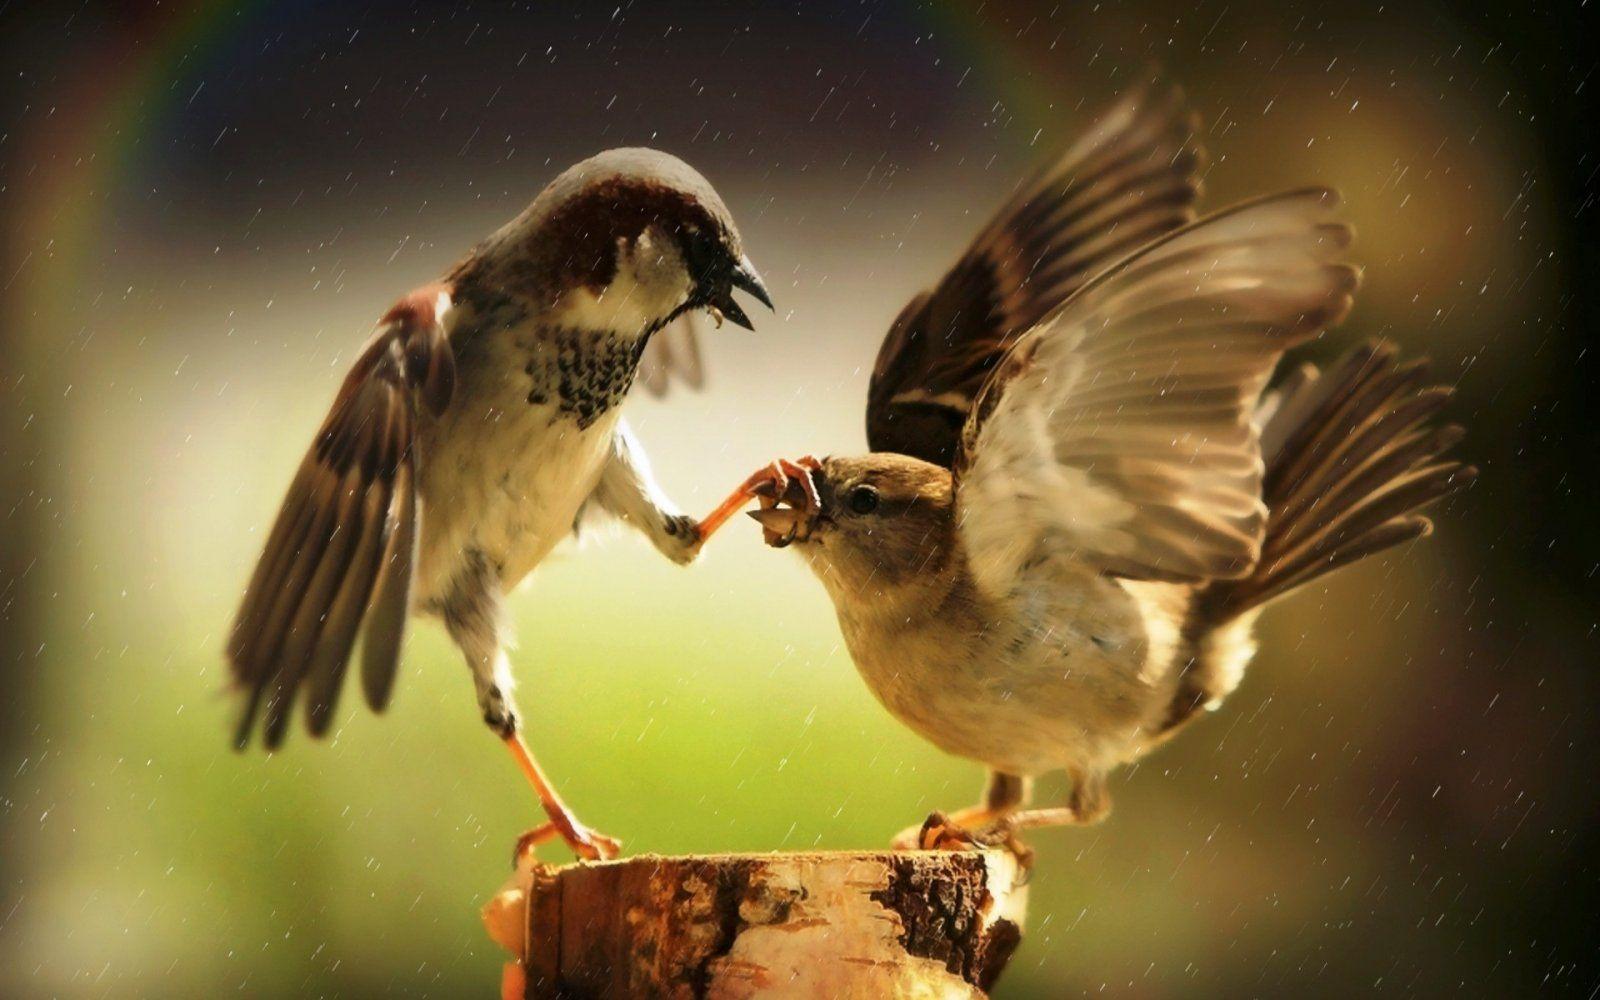 birds-animals-nature-humor-rain-wildlife-rainbows-beak-sparrow-bird-finch-wing-fauna-perching-...jpg